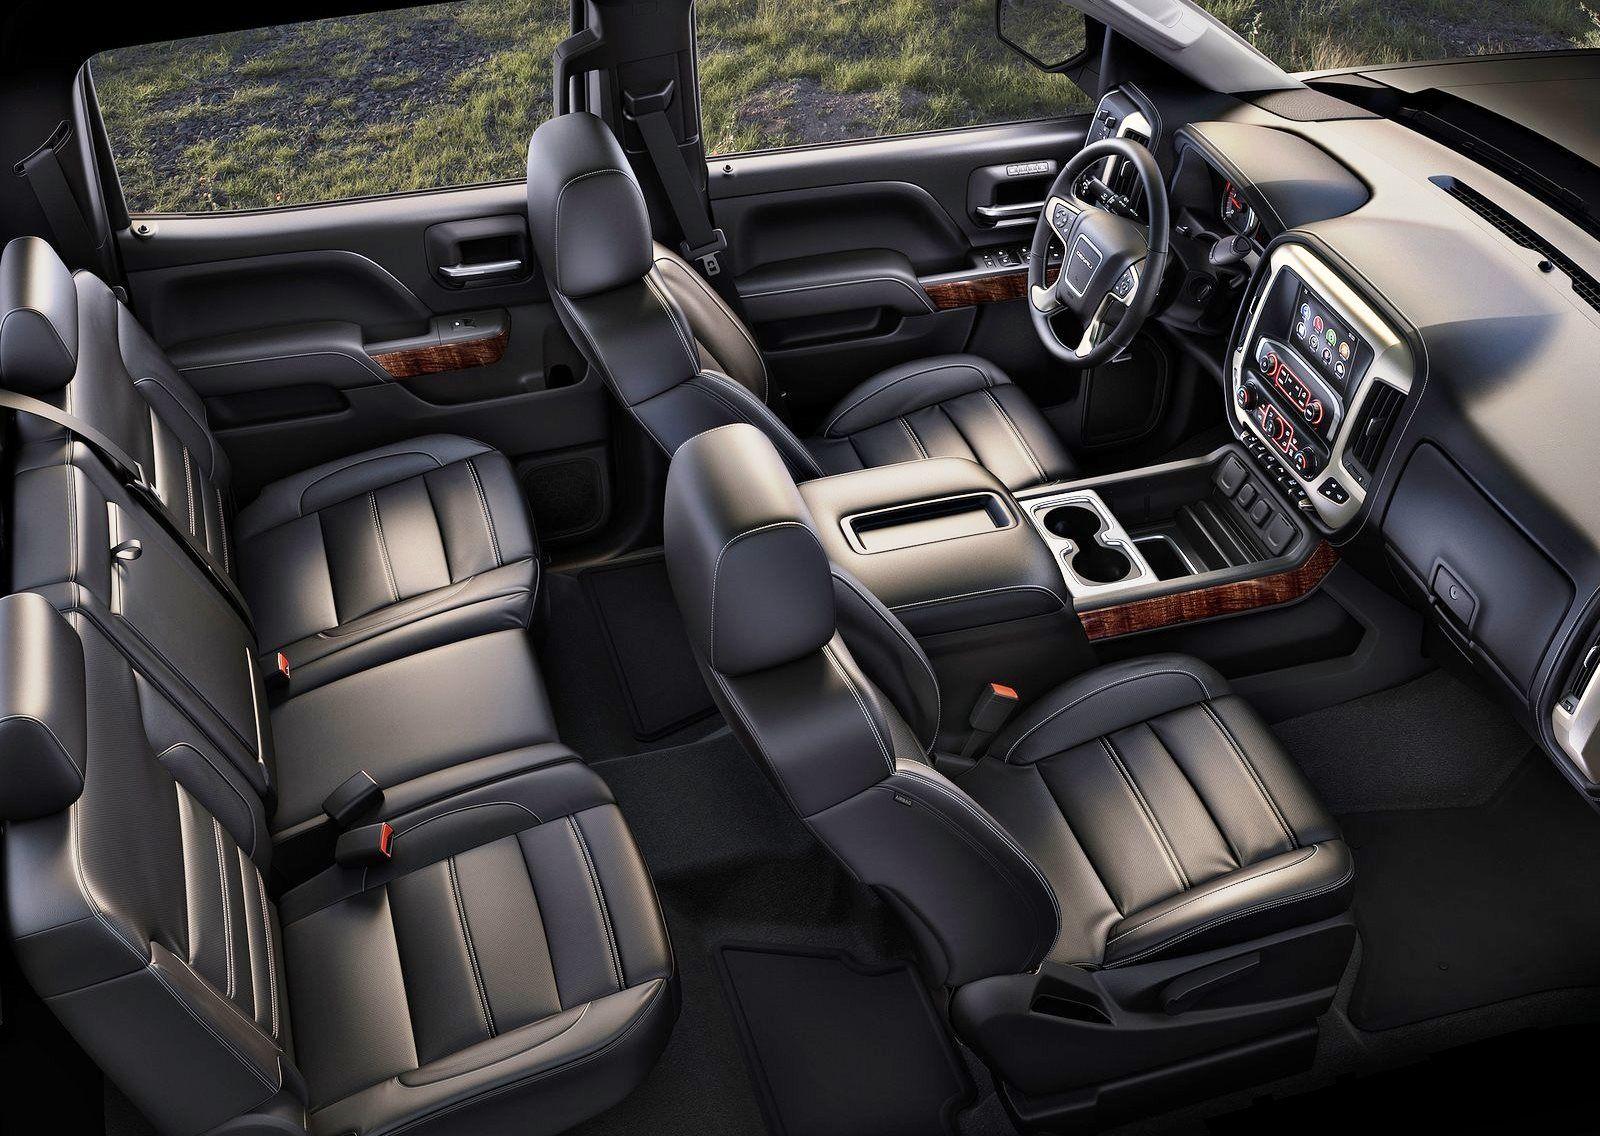 2015 gmc sierra hd interior